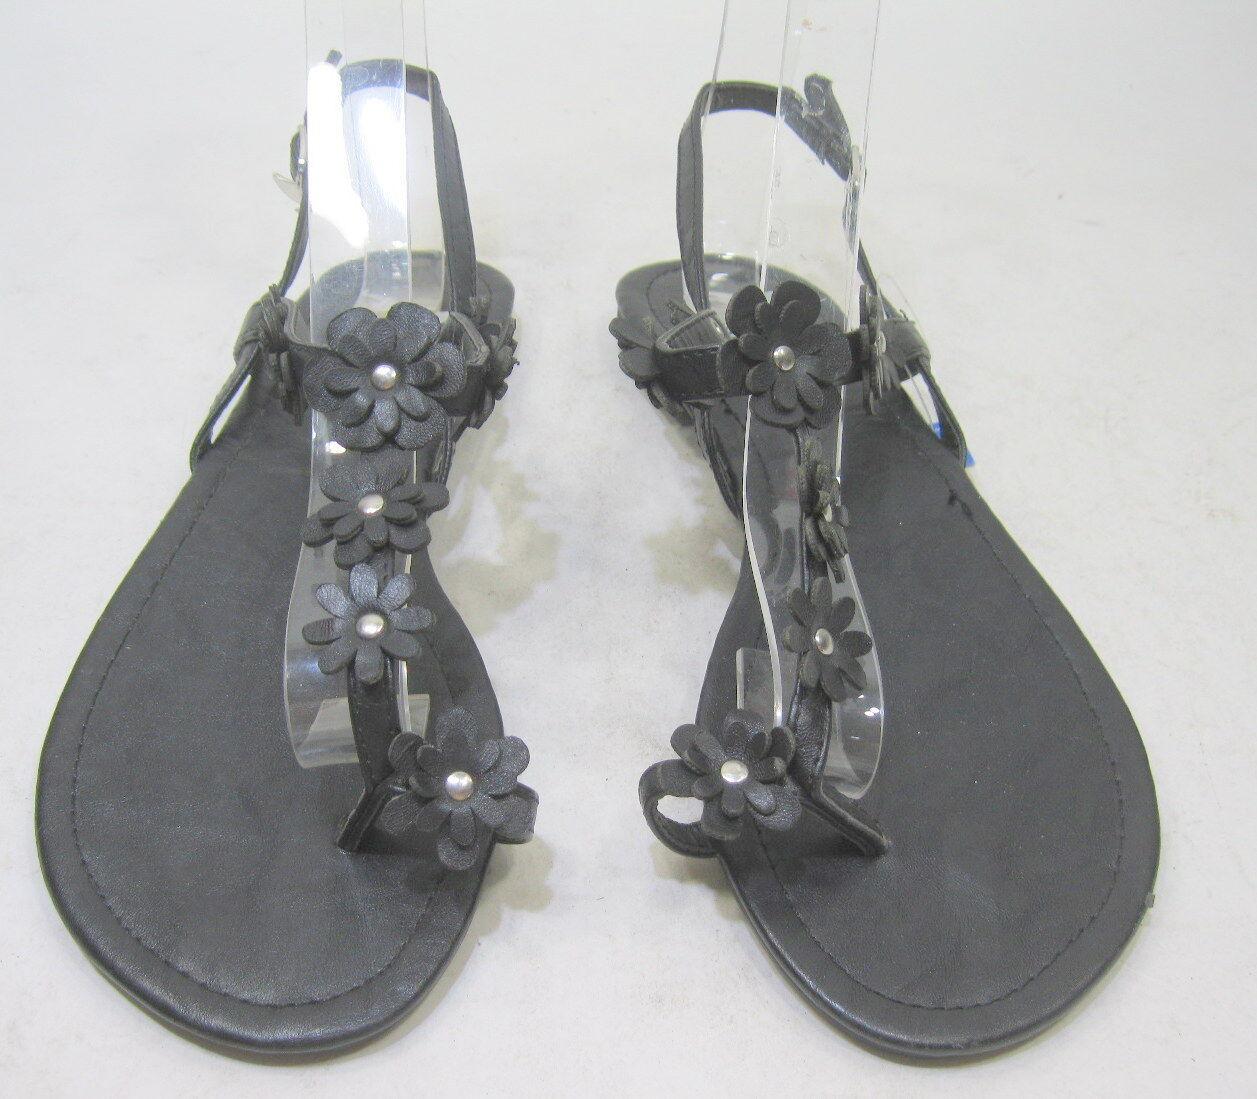 Summer Slingbacks Black Flower Womens Fashion Slingbacks Summer Sexy Sandals Size 6.5 634674